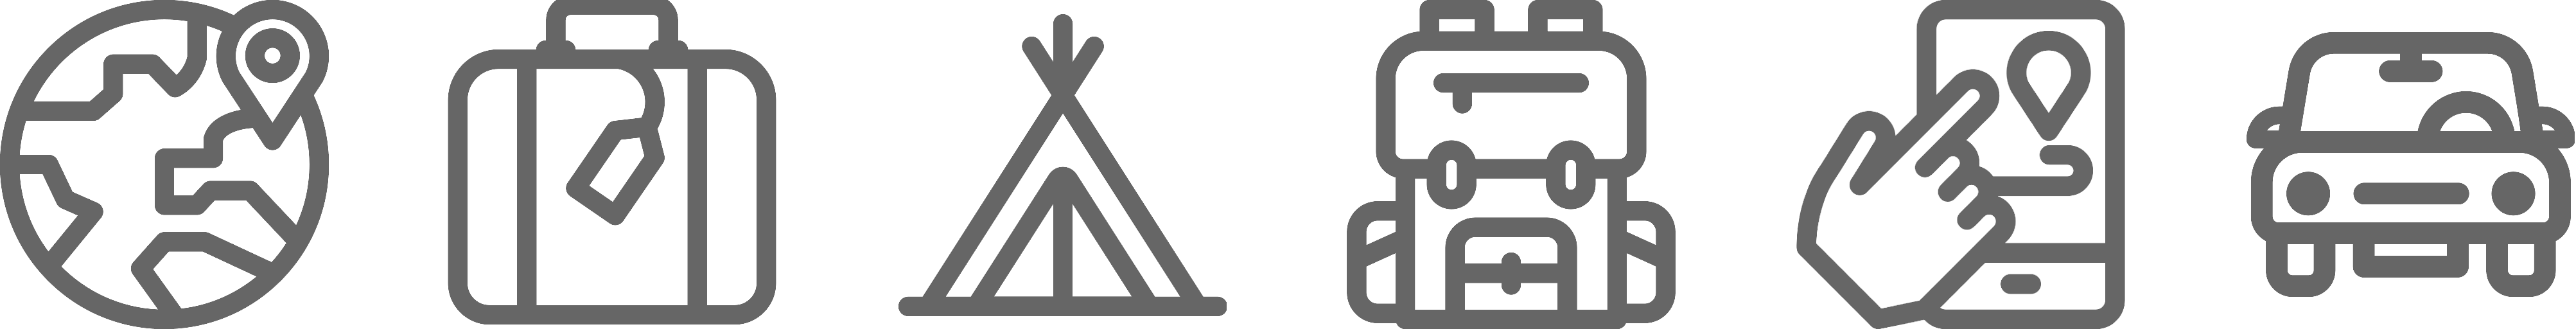 Reiseaccessoires & Outdoor-Gadgets